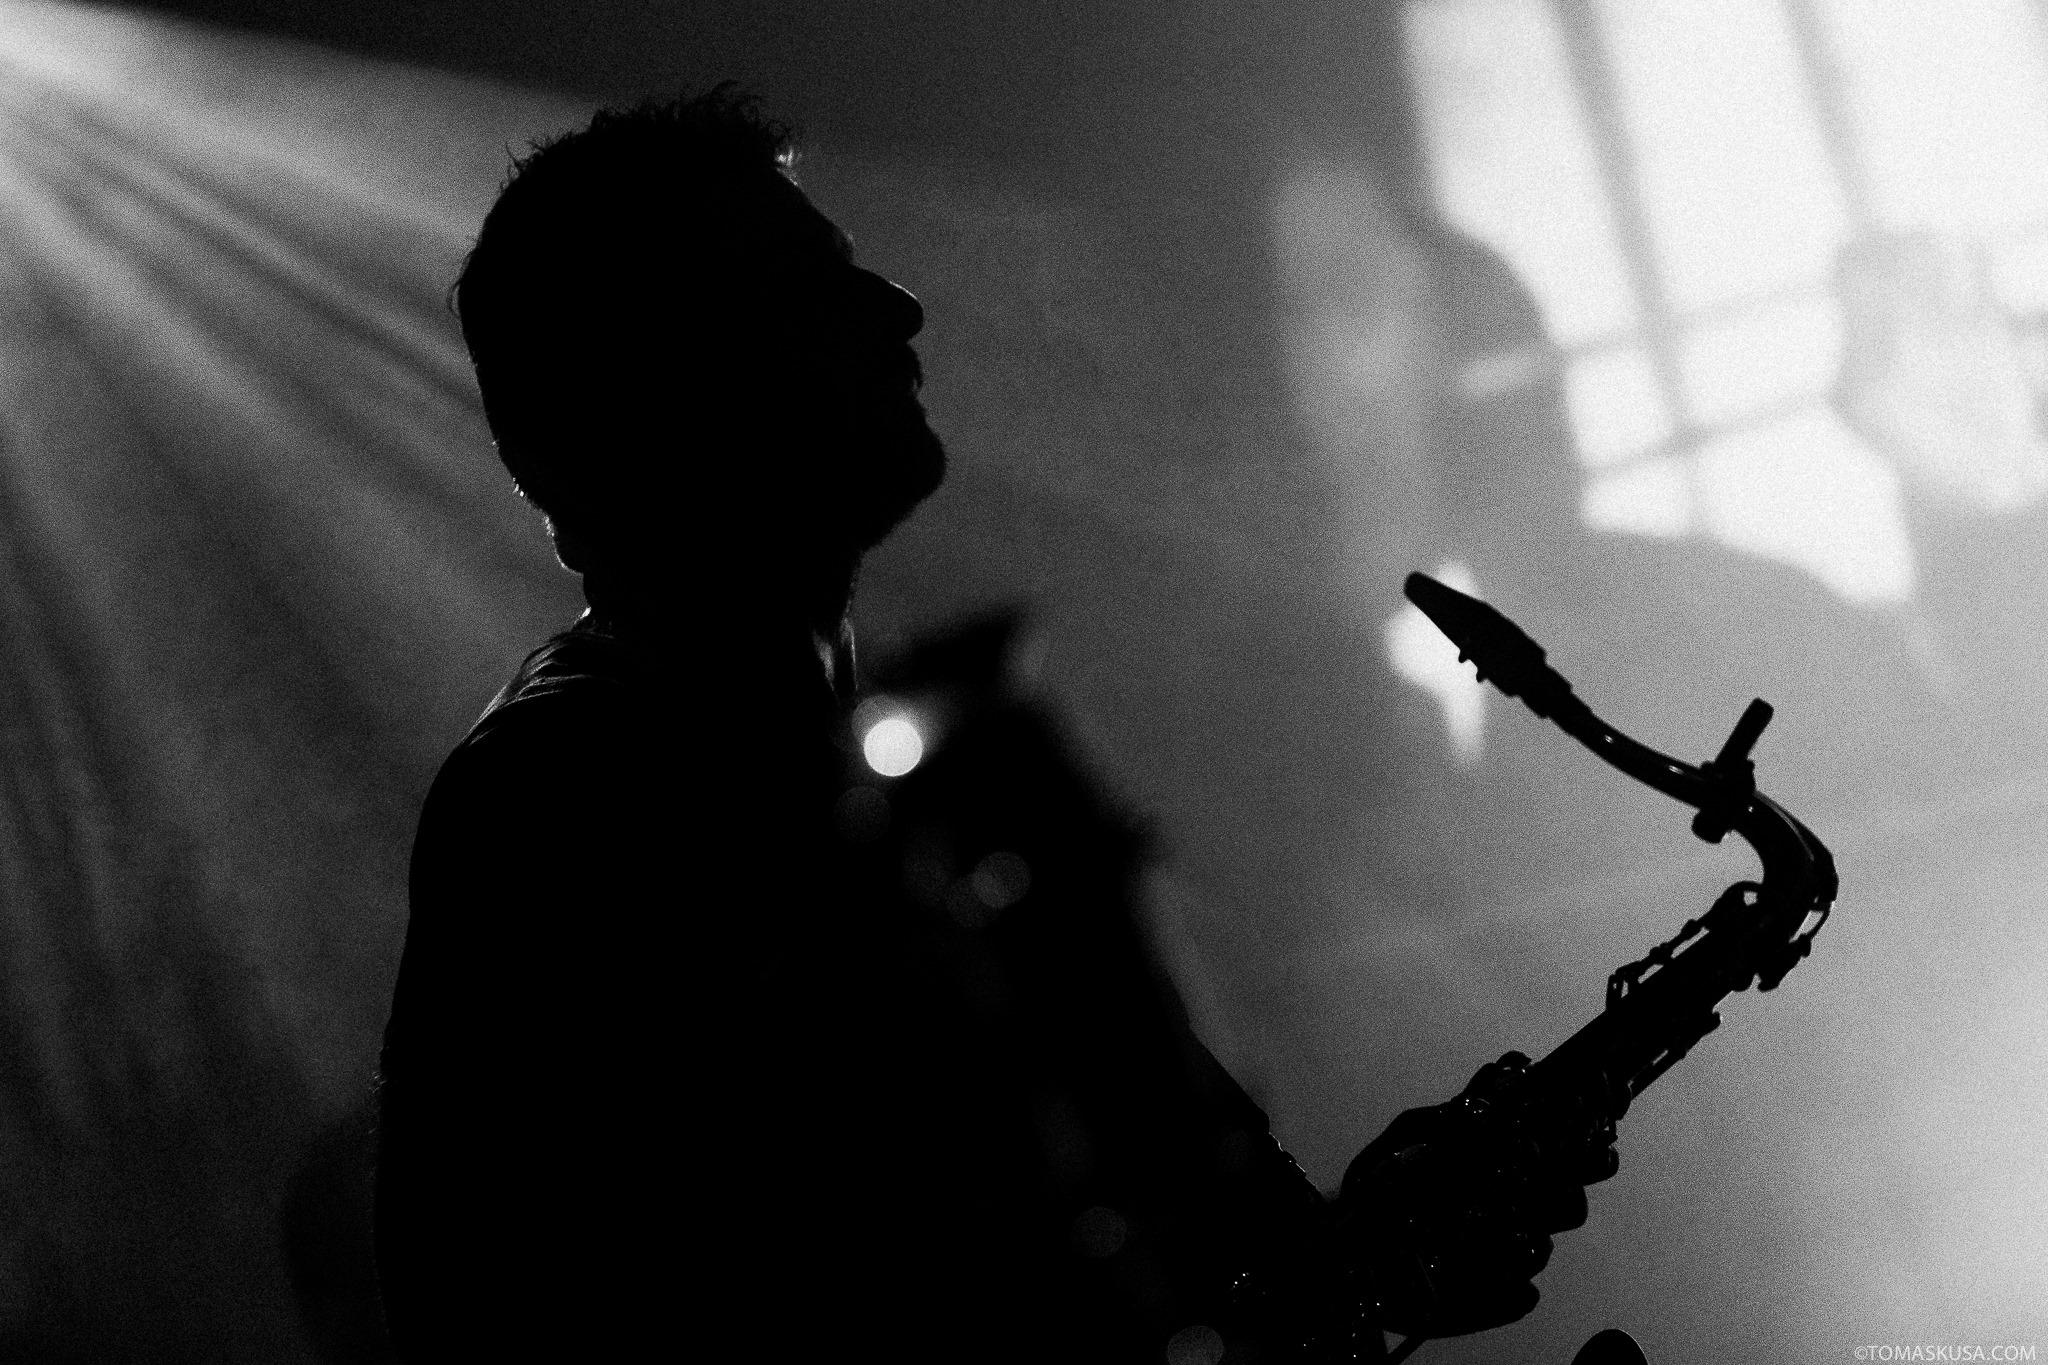 Autumnist - live at Hviezdne Noci Festival, Bytca, 17.08.2018, photo by Tomas Kusa